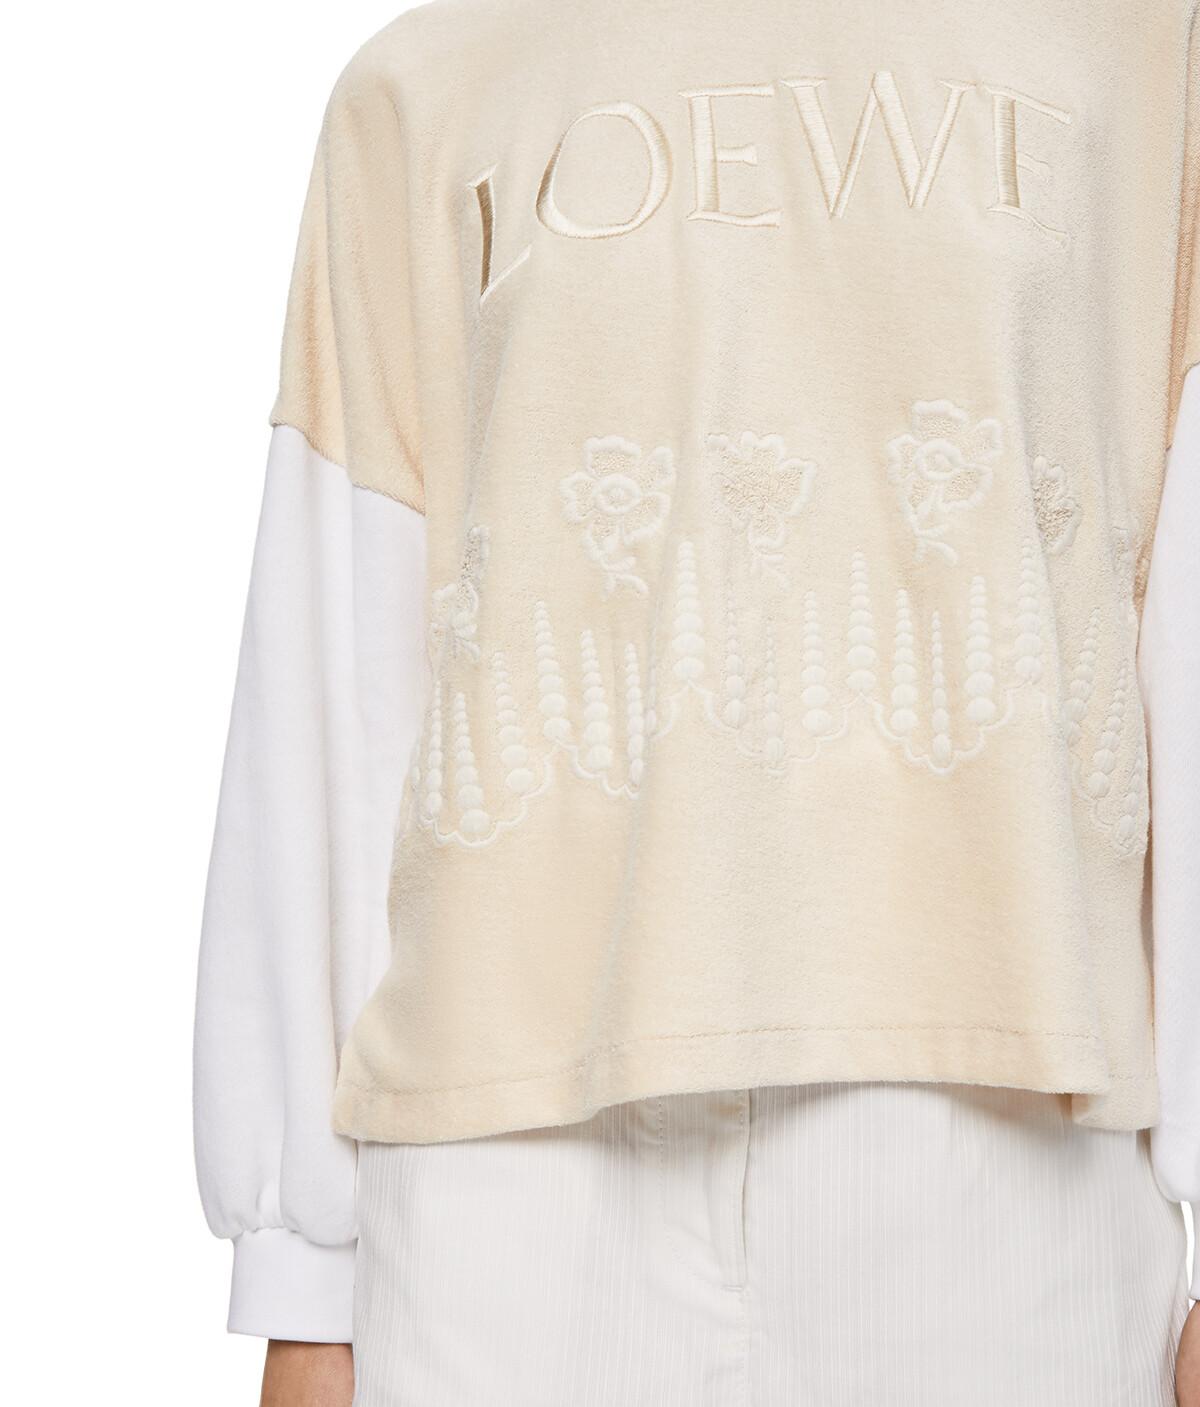 LOEWE Embroidered Sweatshirt Ecru/White front